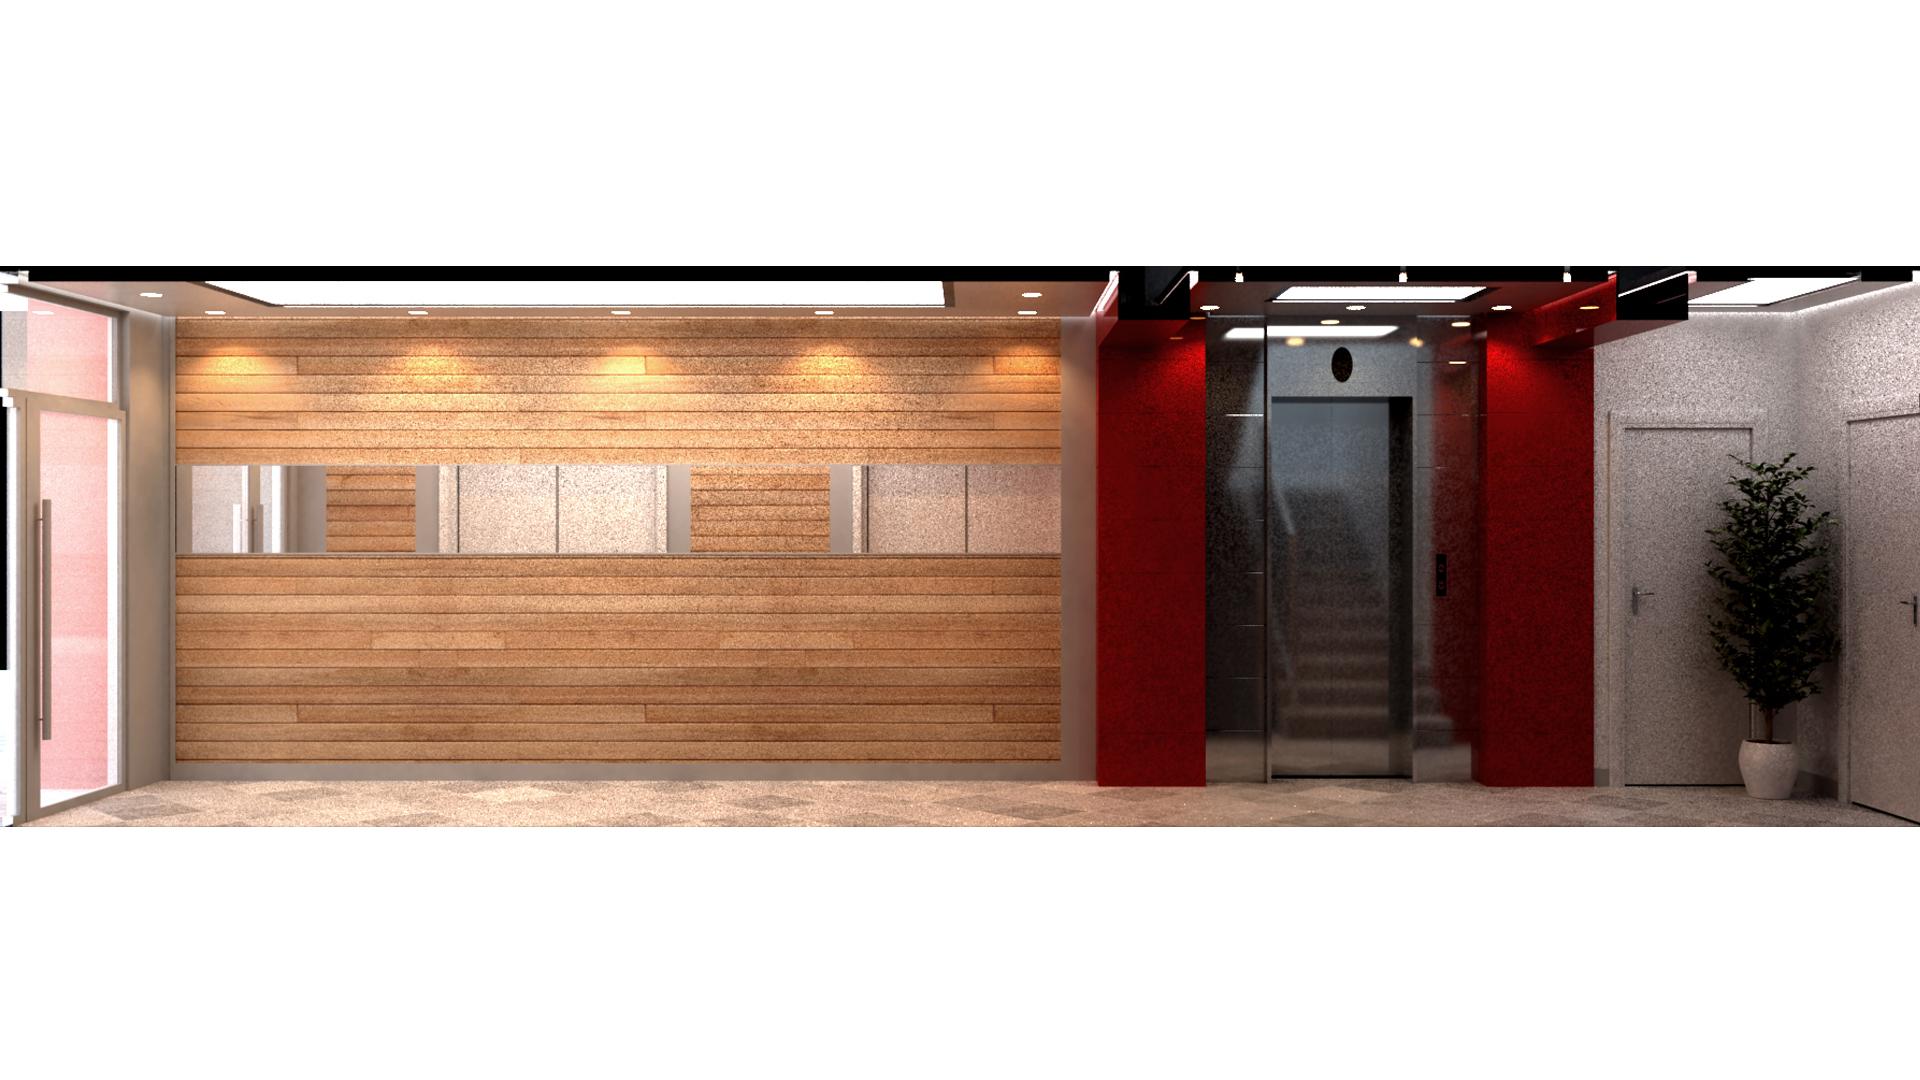 Dintel 2 estudio de arquitectura propuesta decorativa - Dintel de madera ...